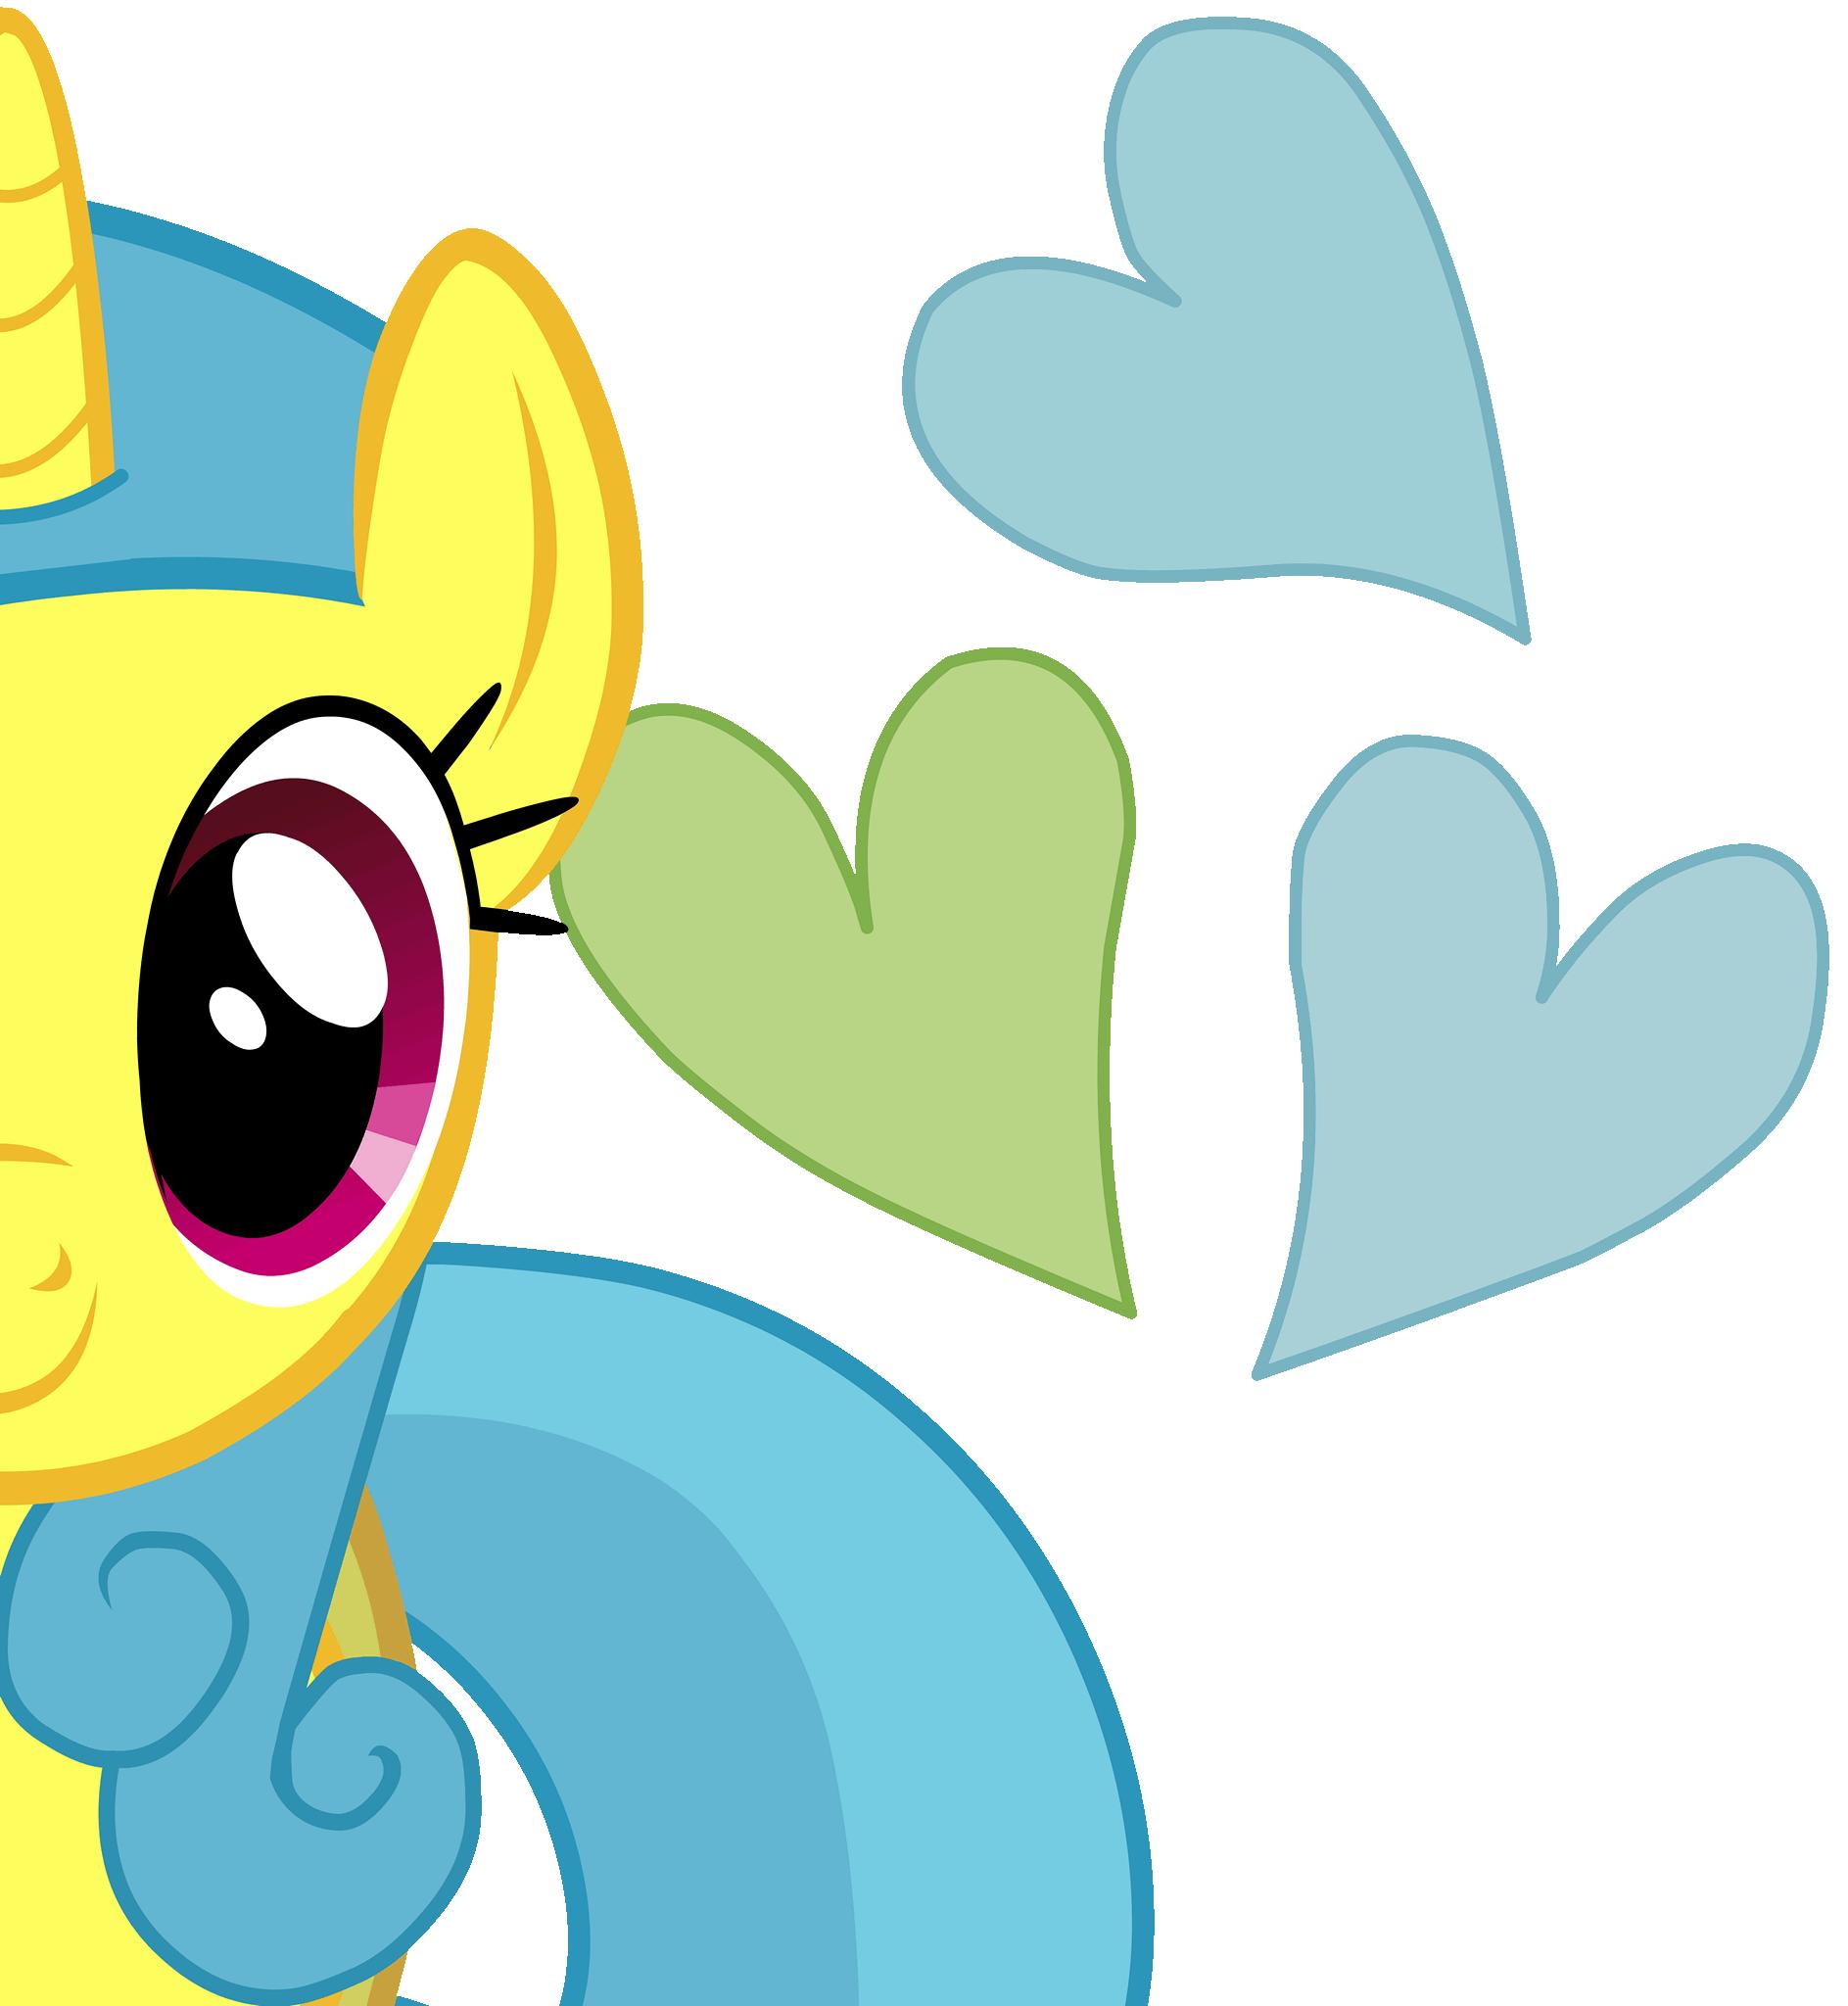 Lemon Hearts My little pony comic, Mlp my little pony